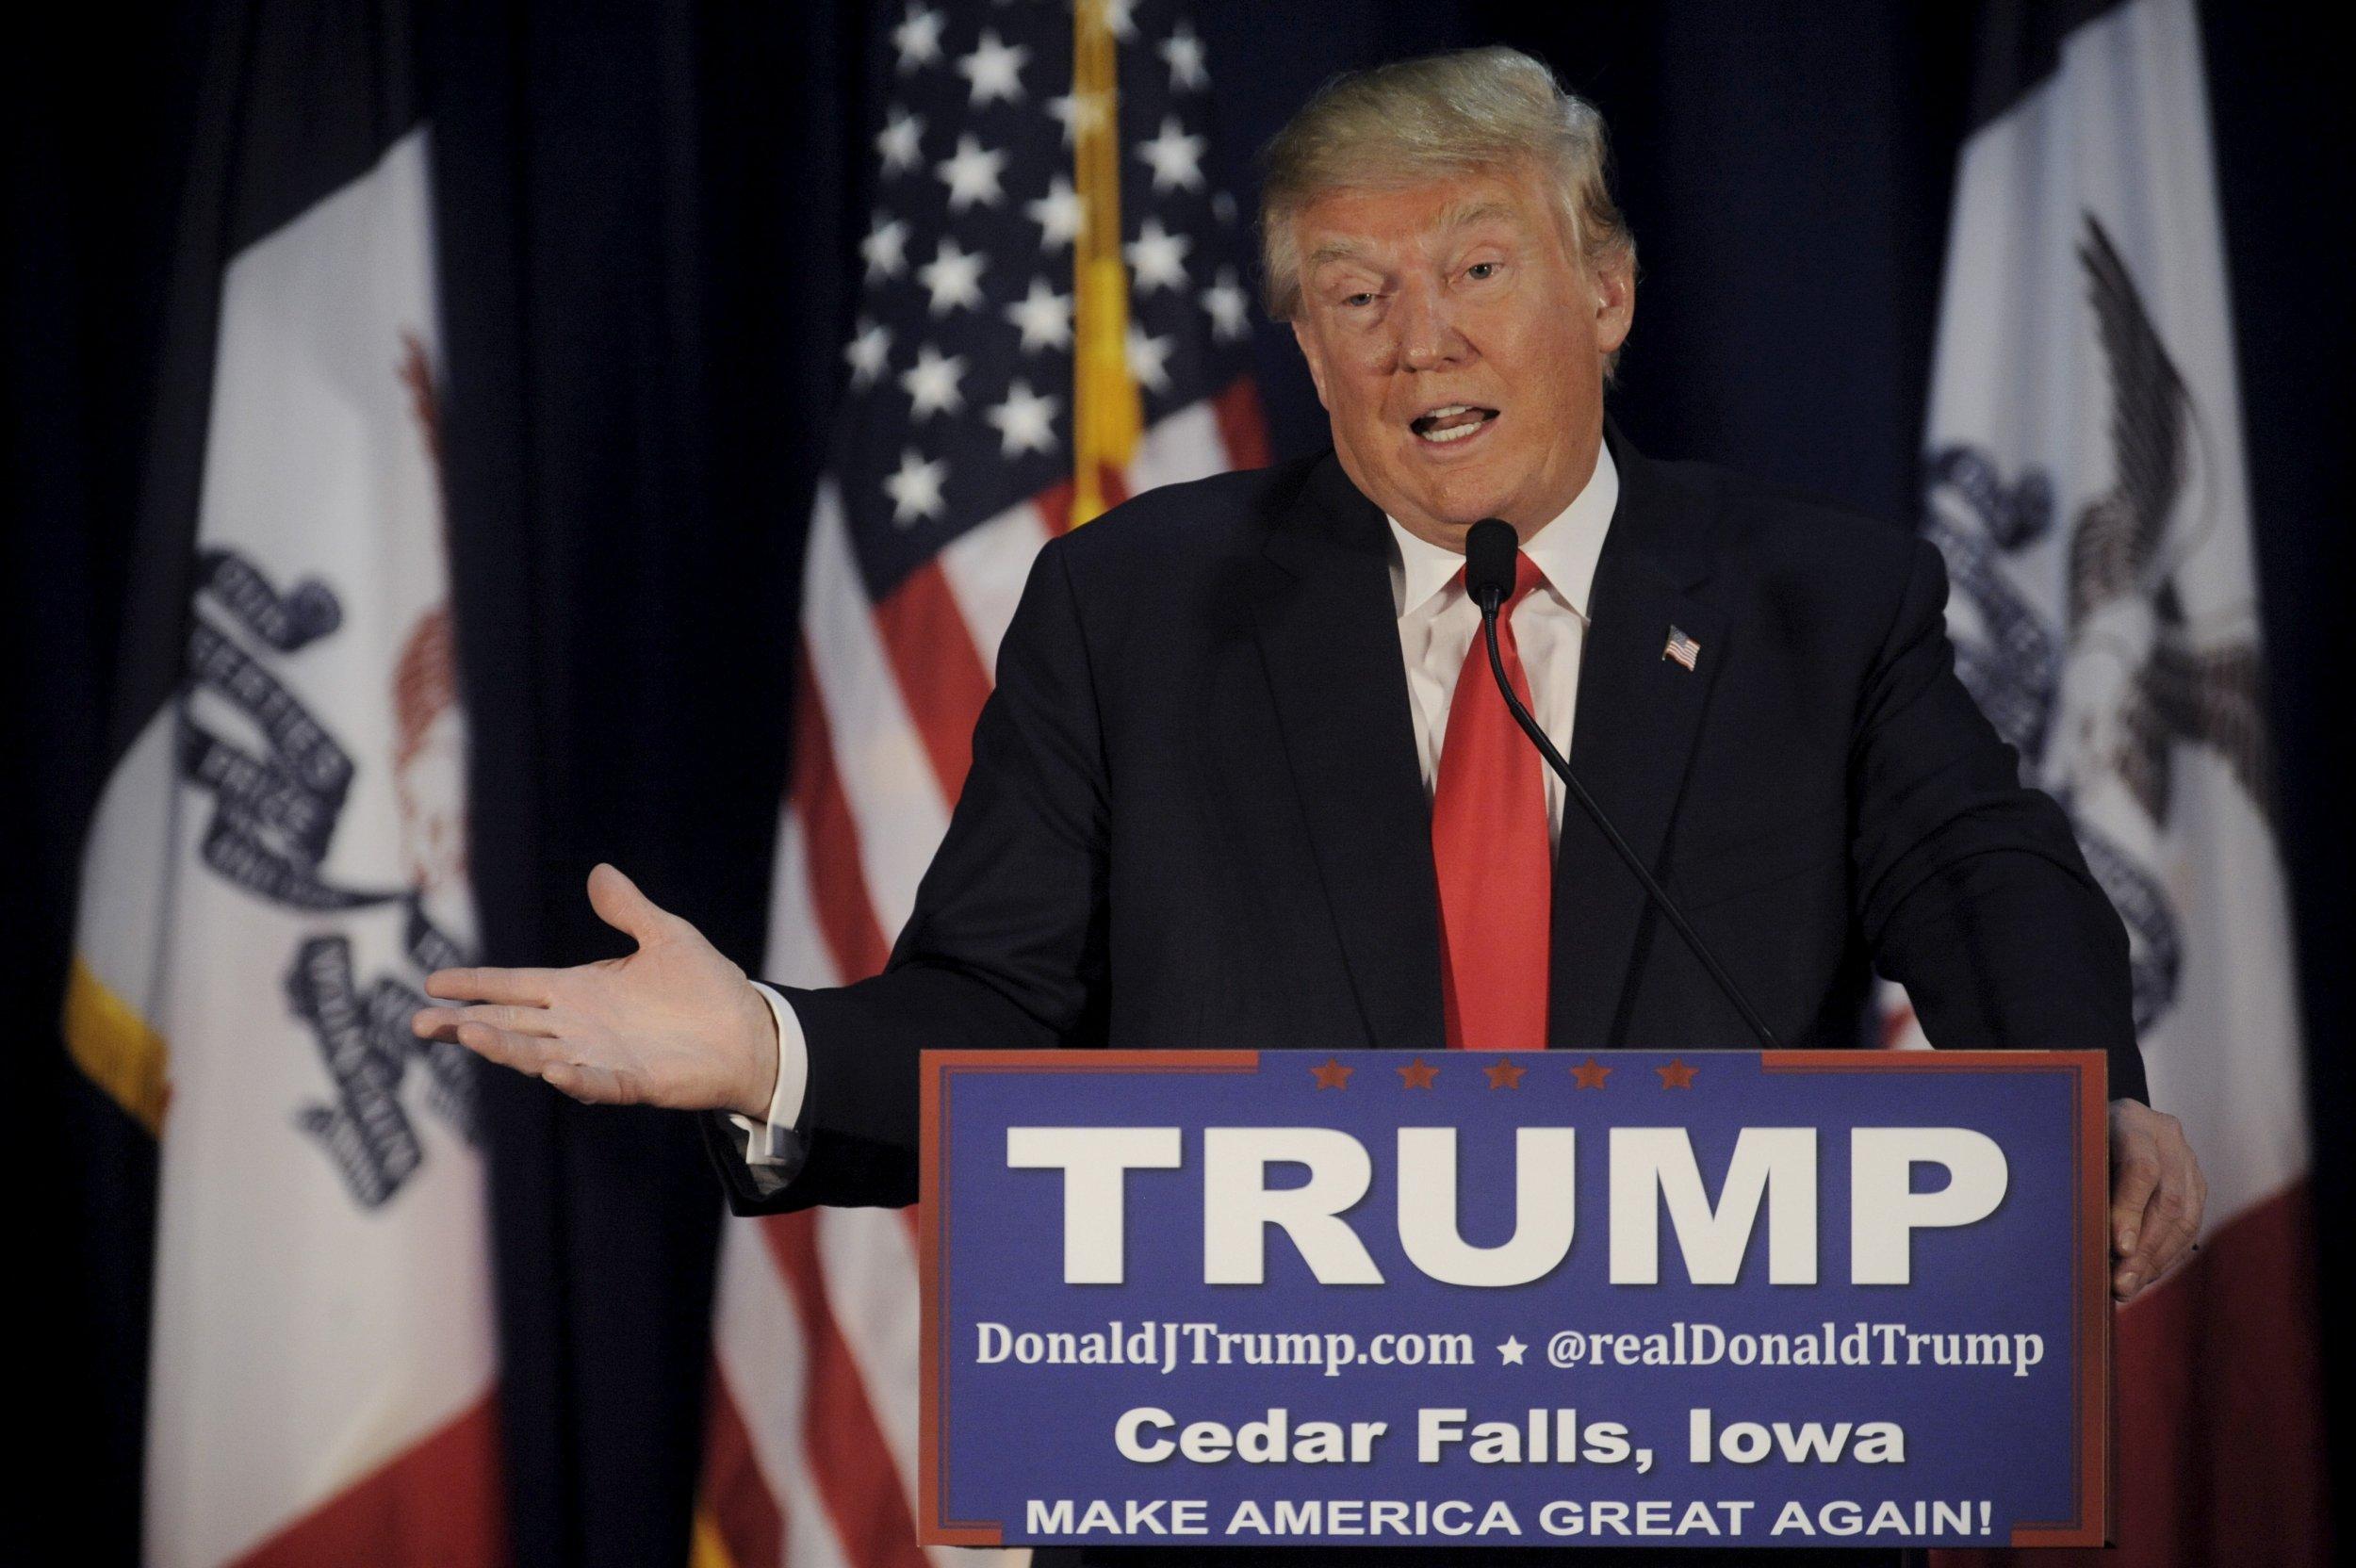 0114_Donald_Trump_leads_Ted_Cruz_poll_01